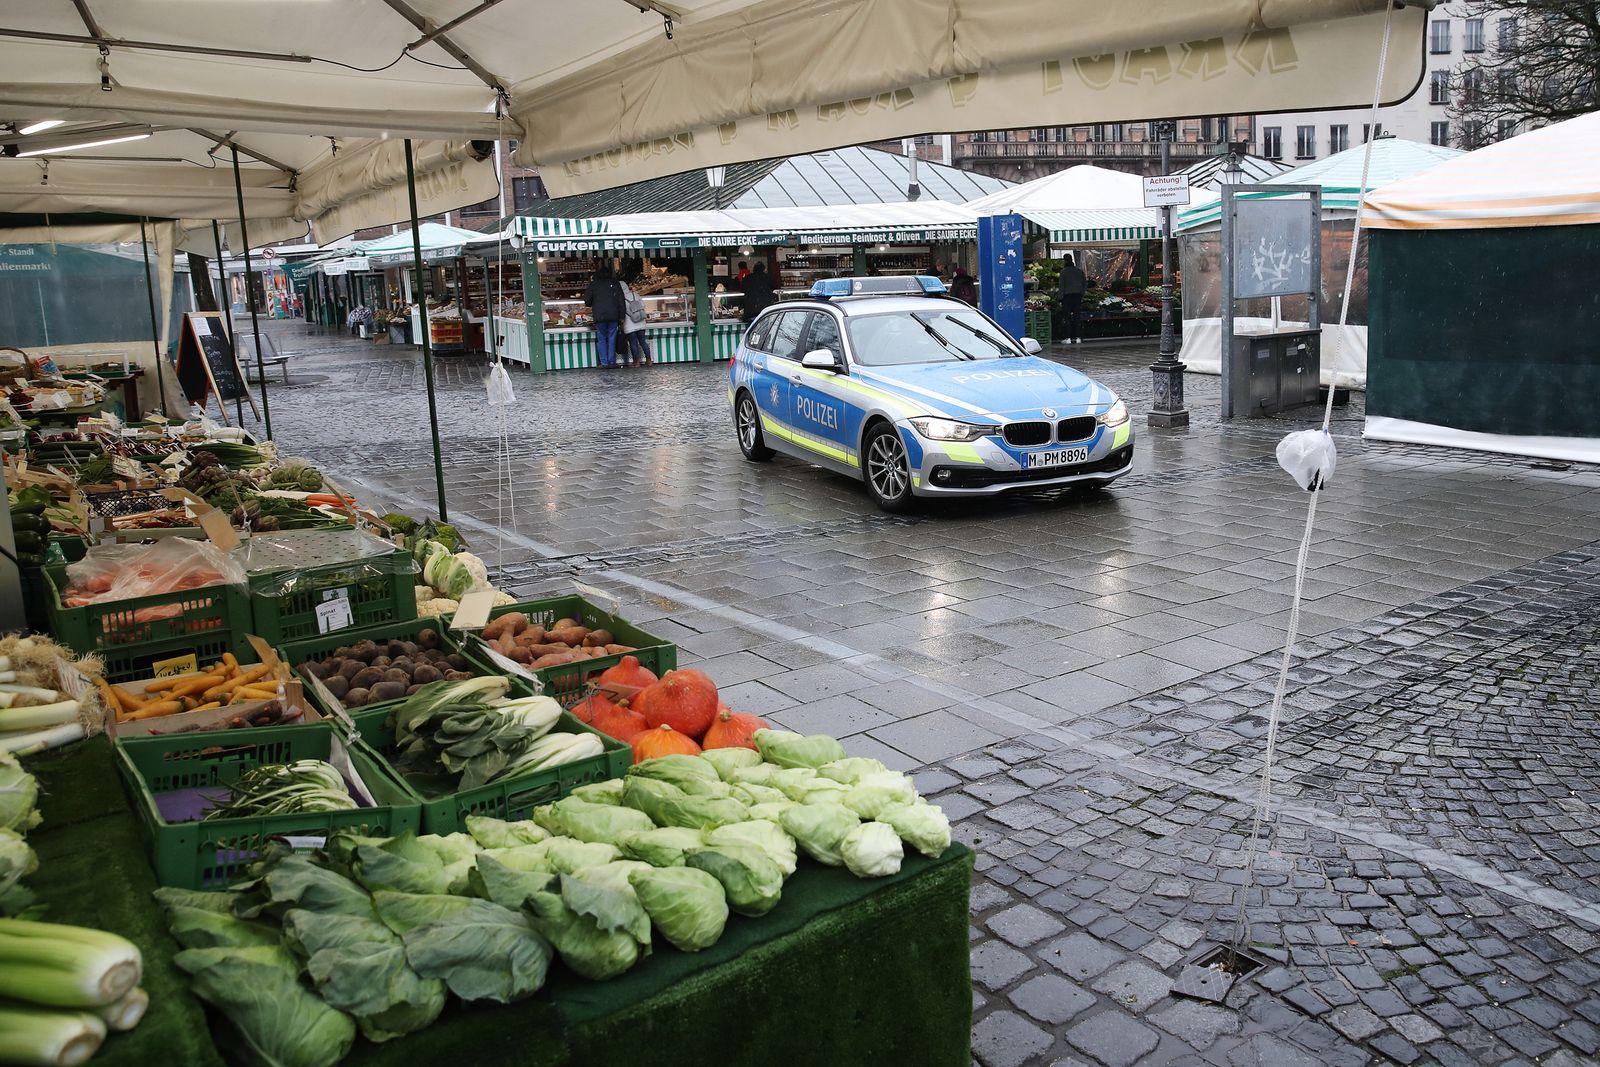 Bavaria Starts Dawn-To-Dusk Curfew As Measure To Slow Coronavirus Spread